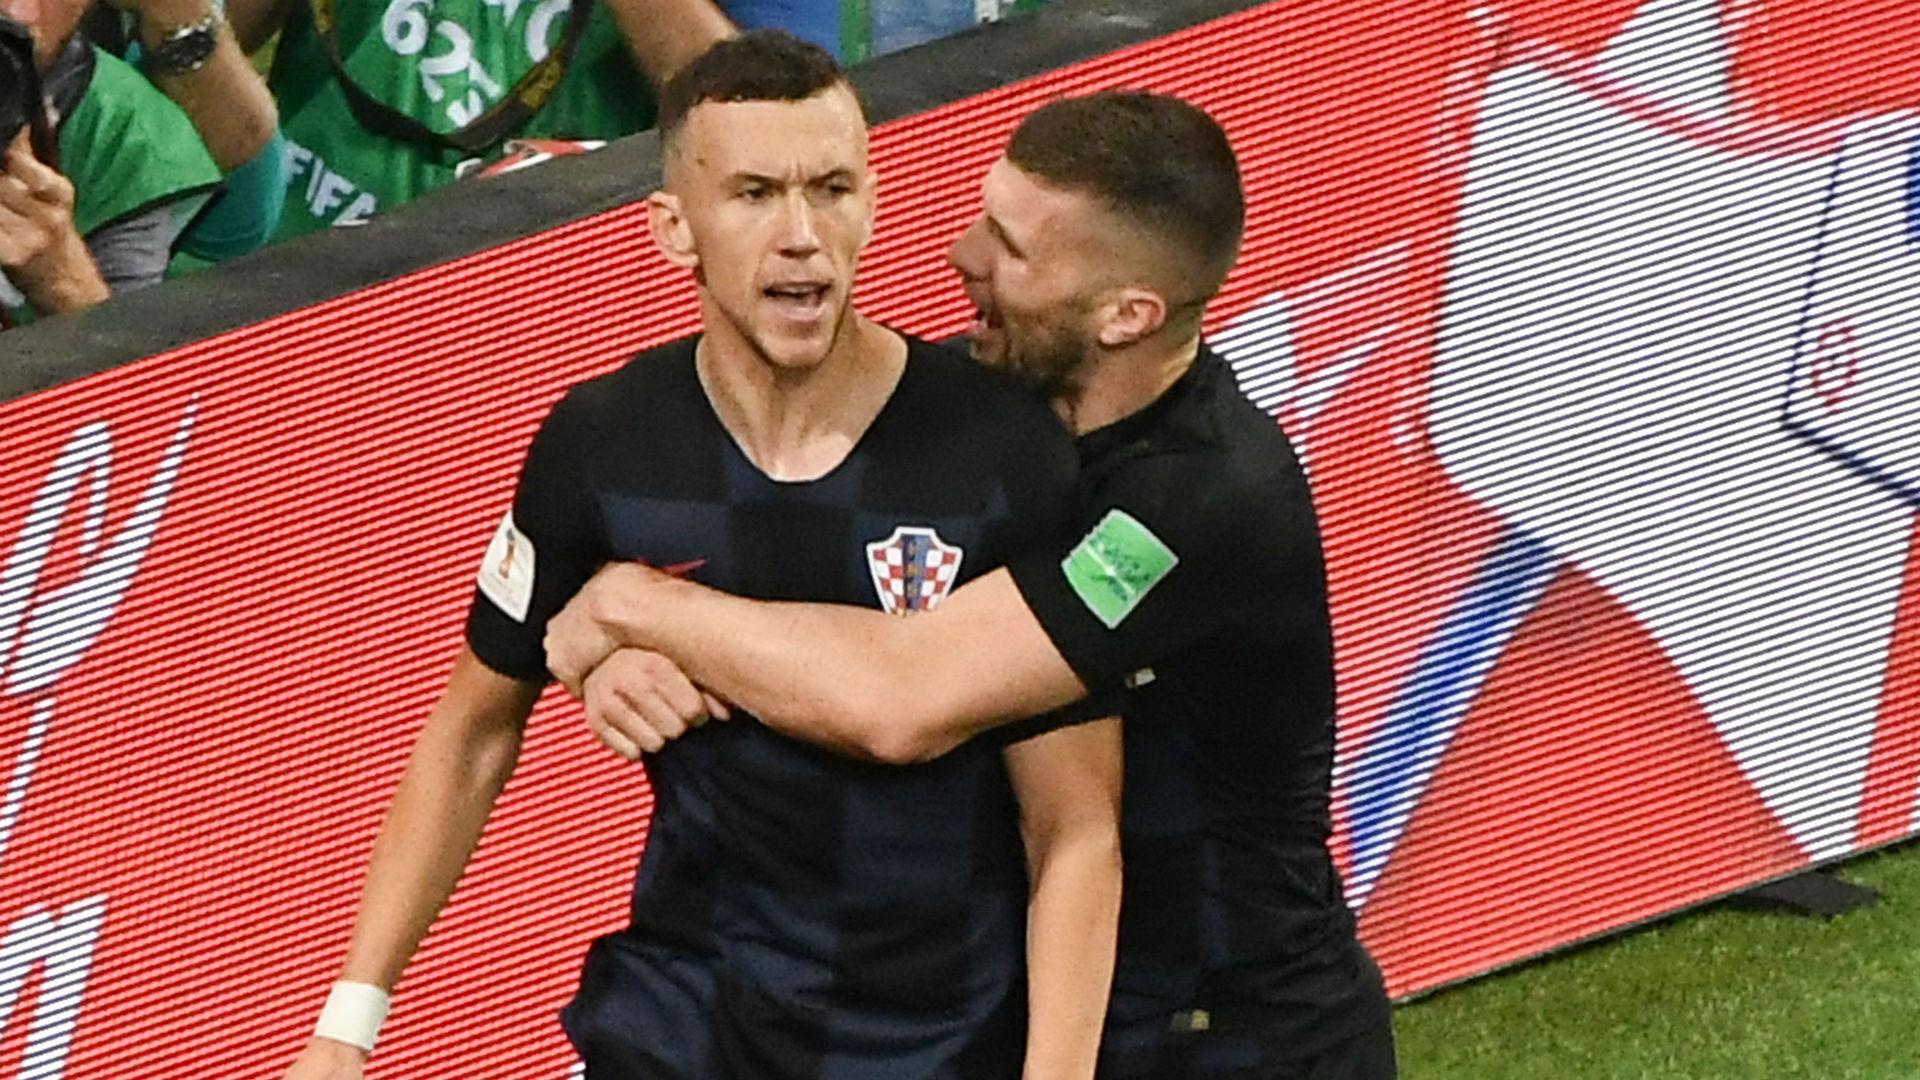 croatia england - ivan perisic ante rebic goal - world cup - 11072018